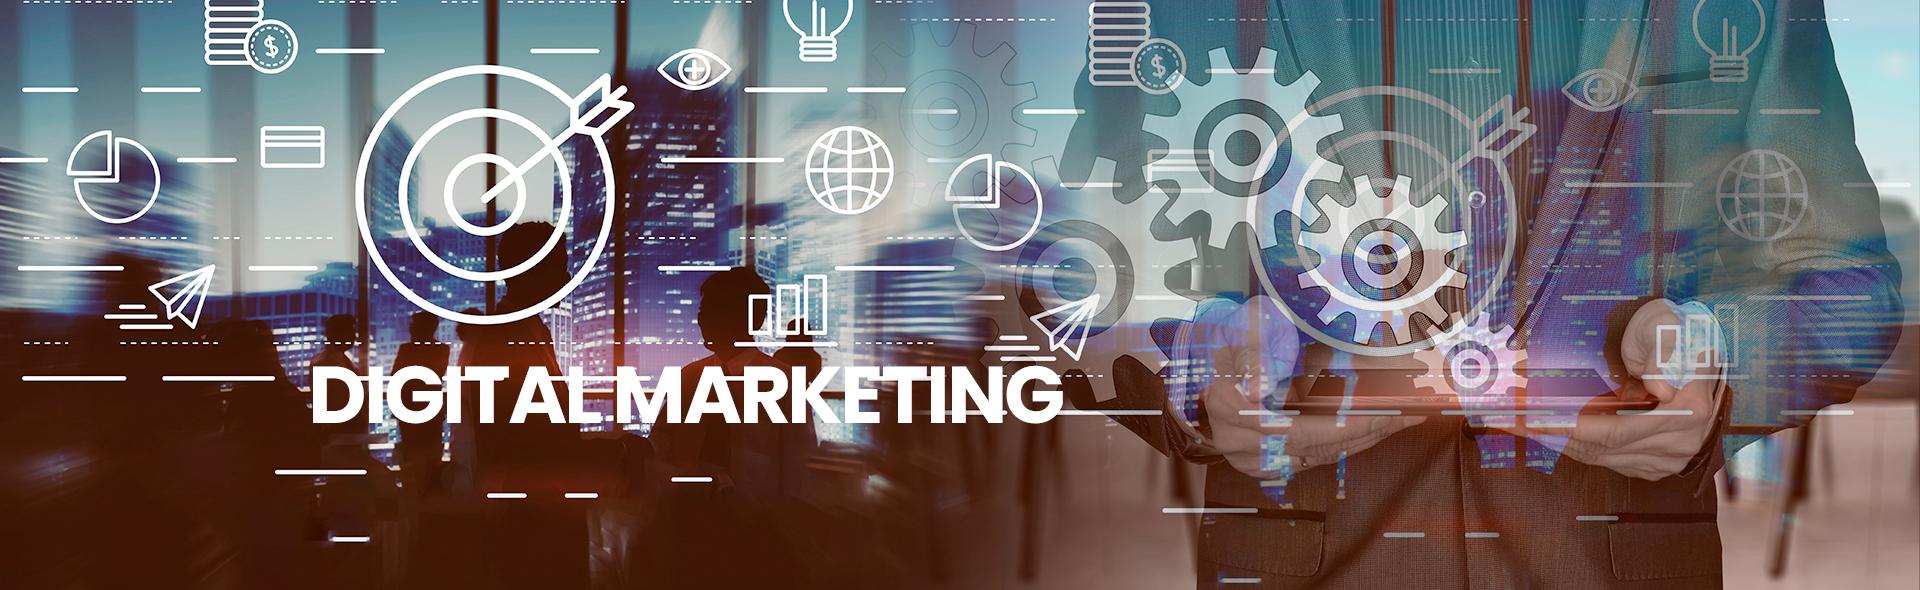 Customer services digital marketing